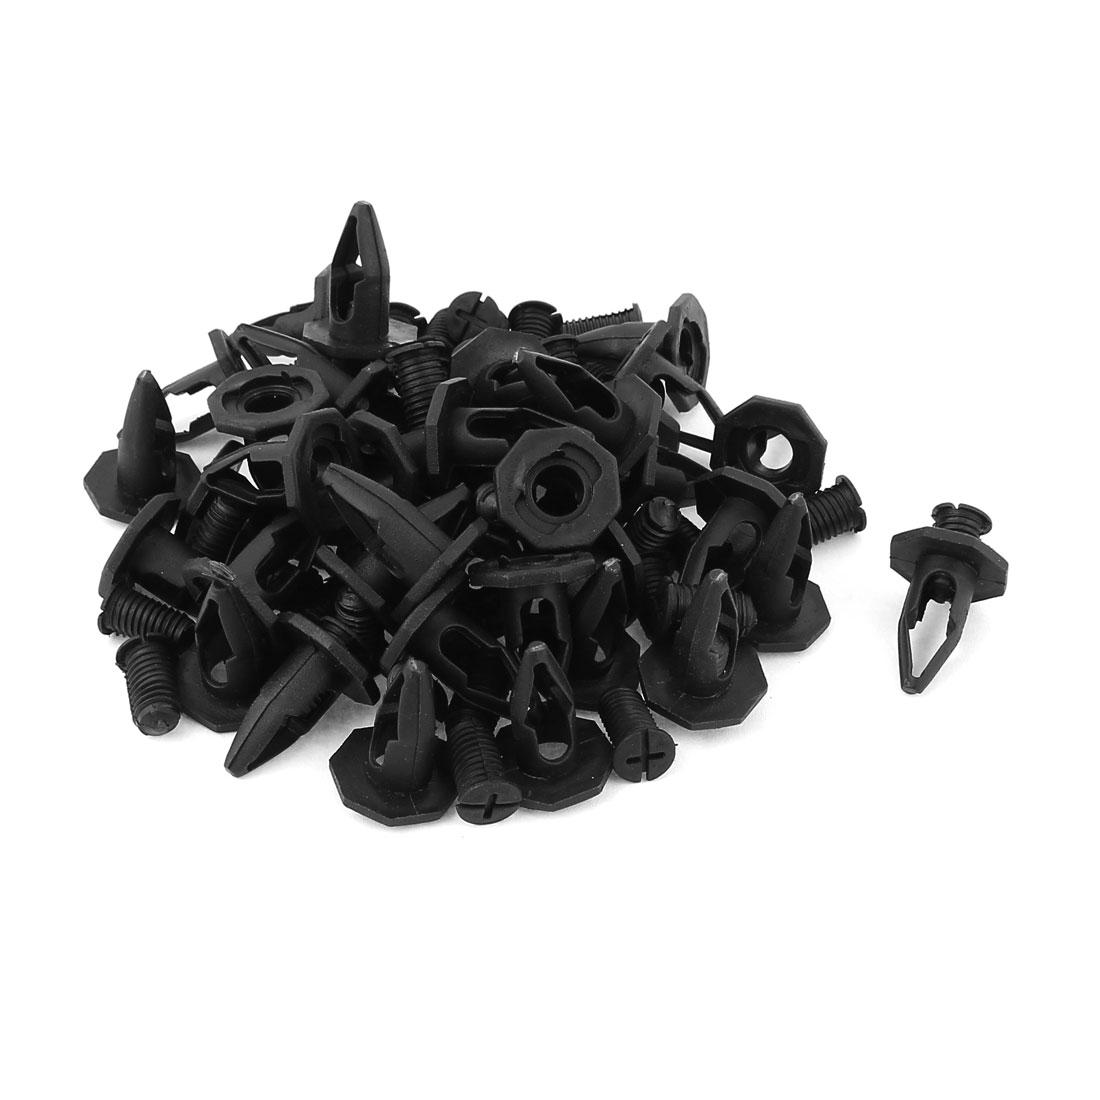 40Pcs 10mm Hole Diameter Plastic Rivet Clips Black for Car Van Truck